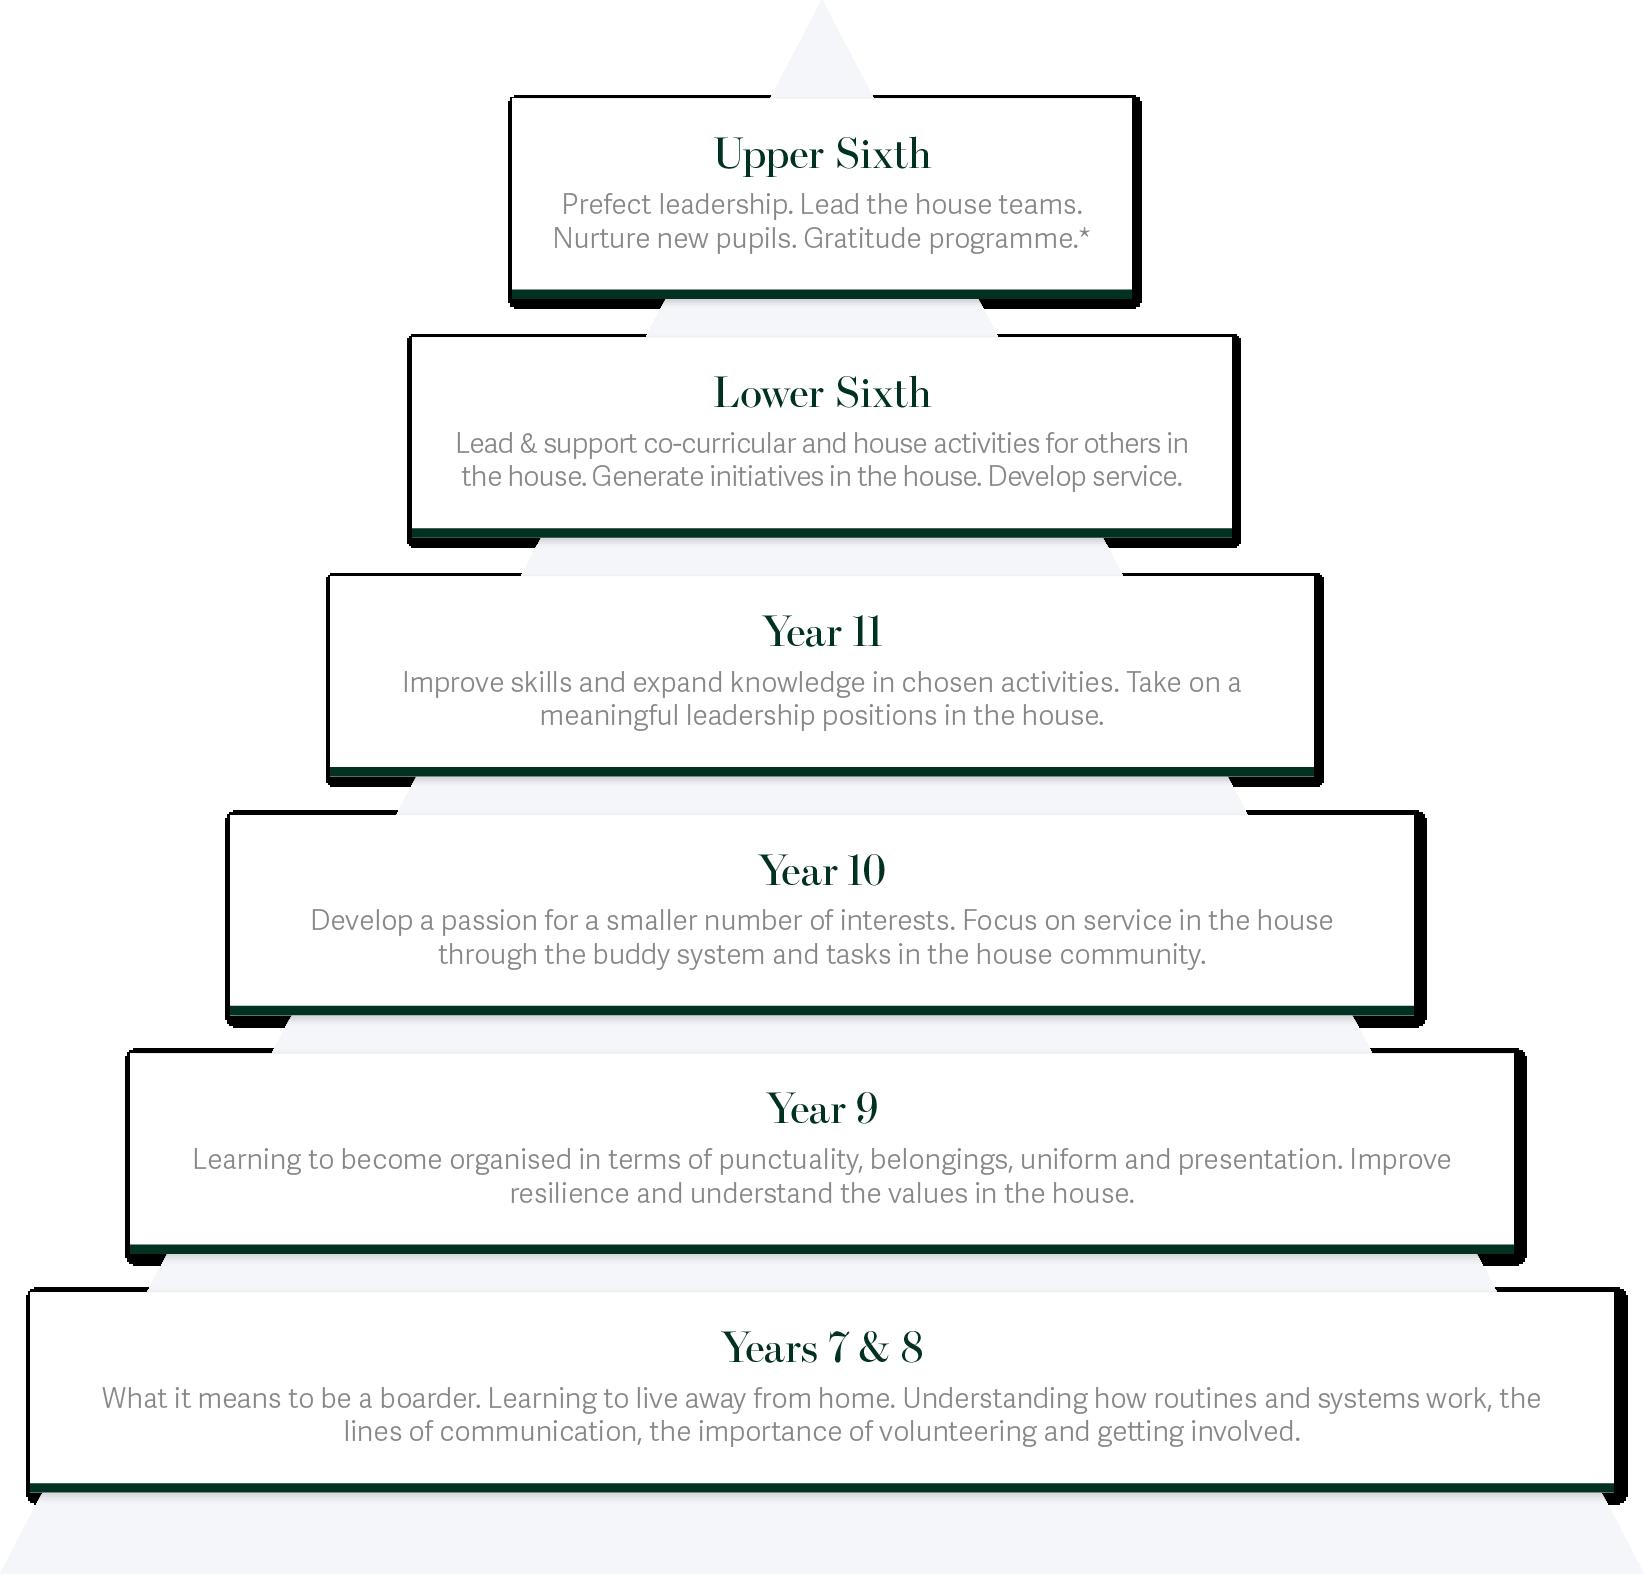 Boarding Programme Pyramid